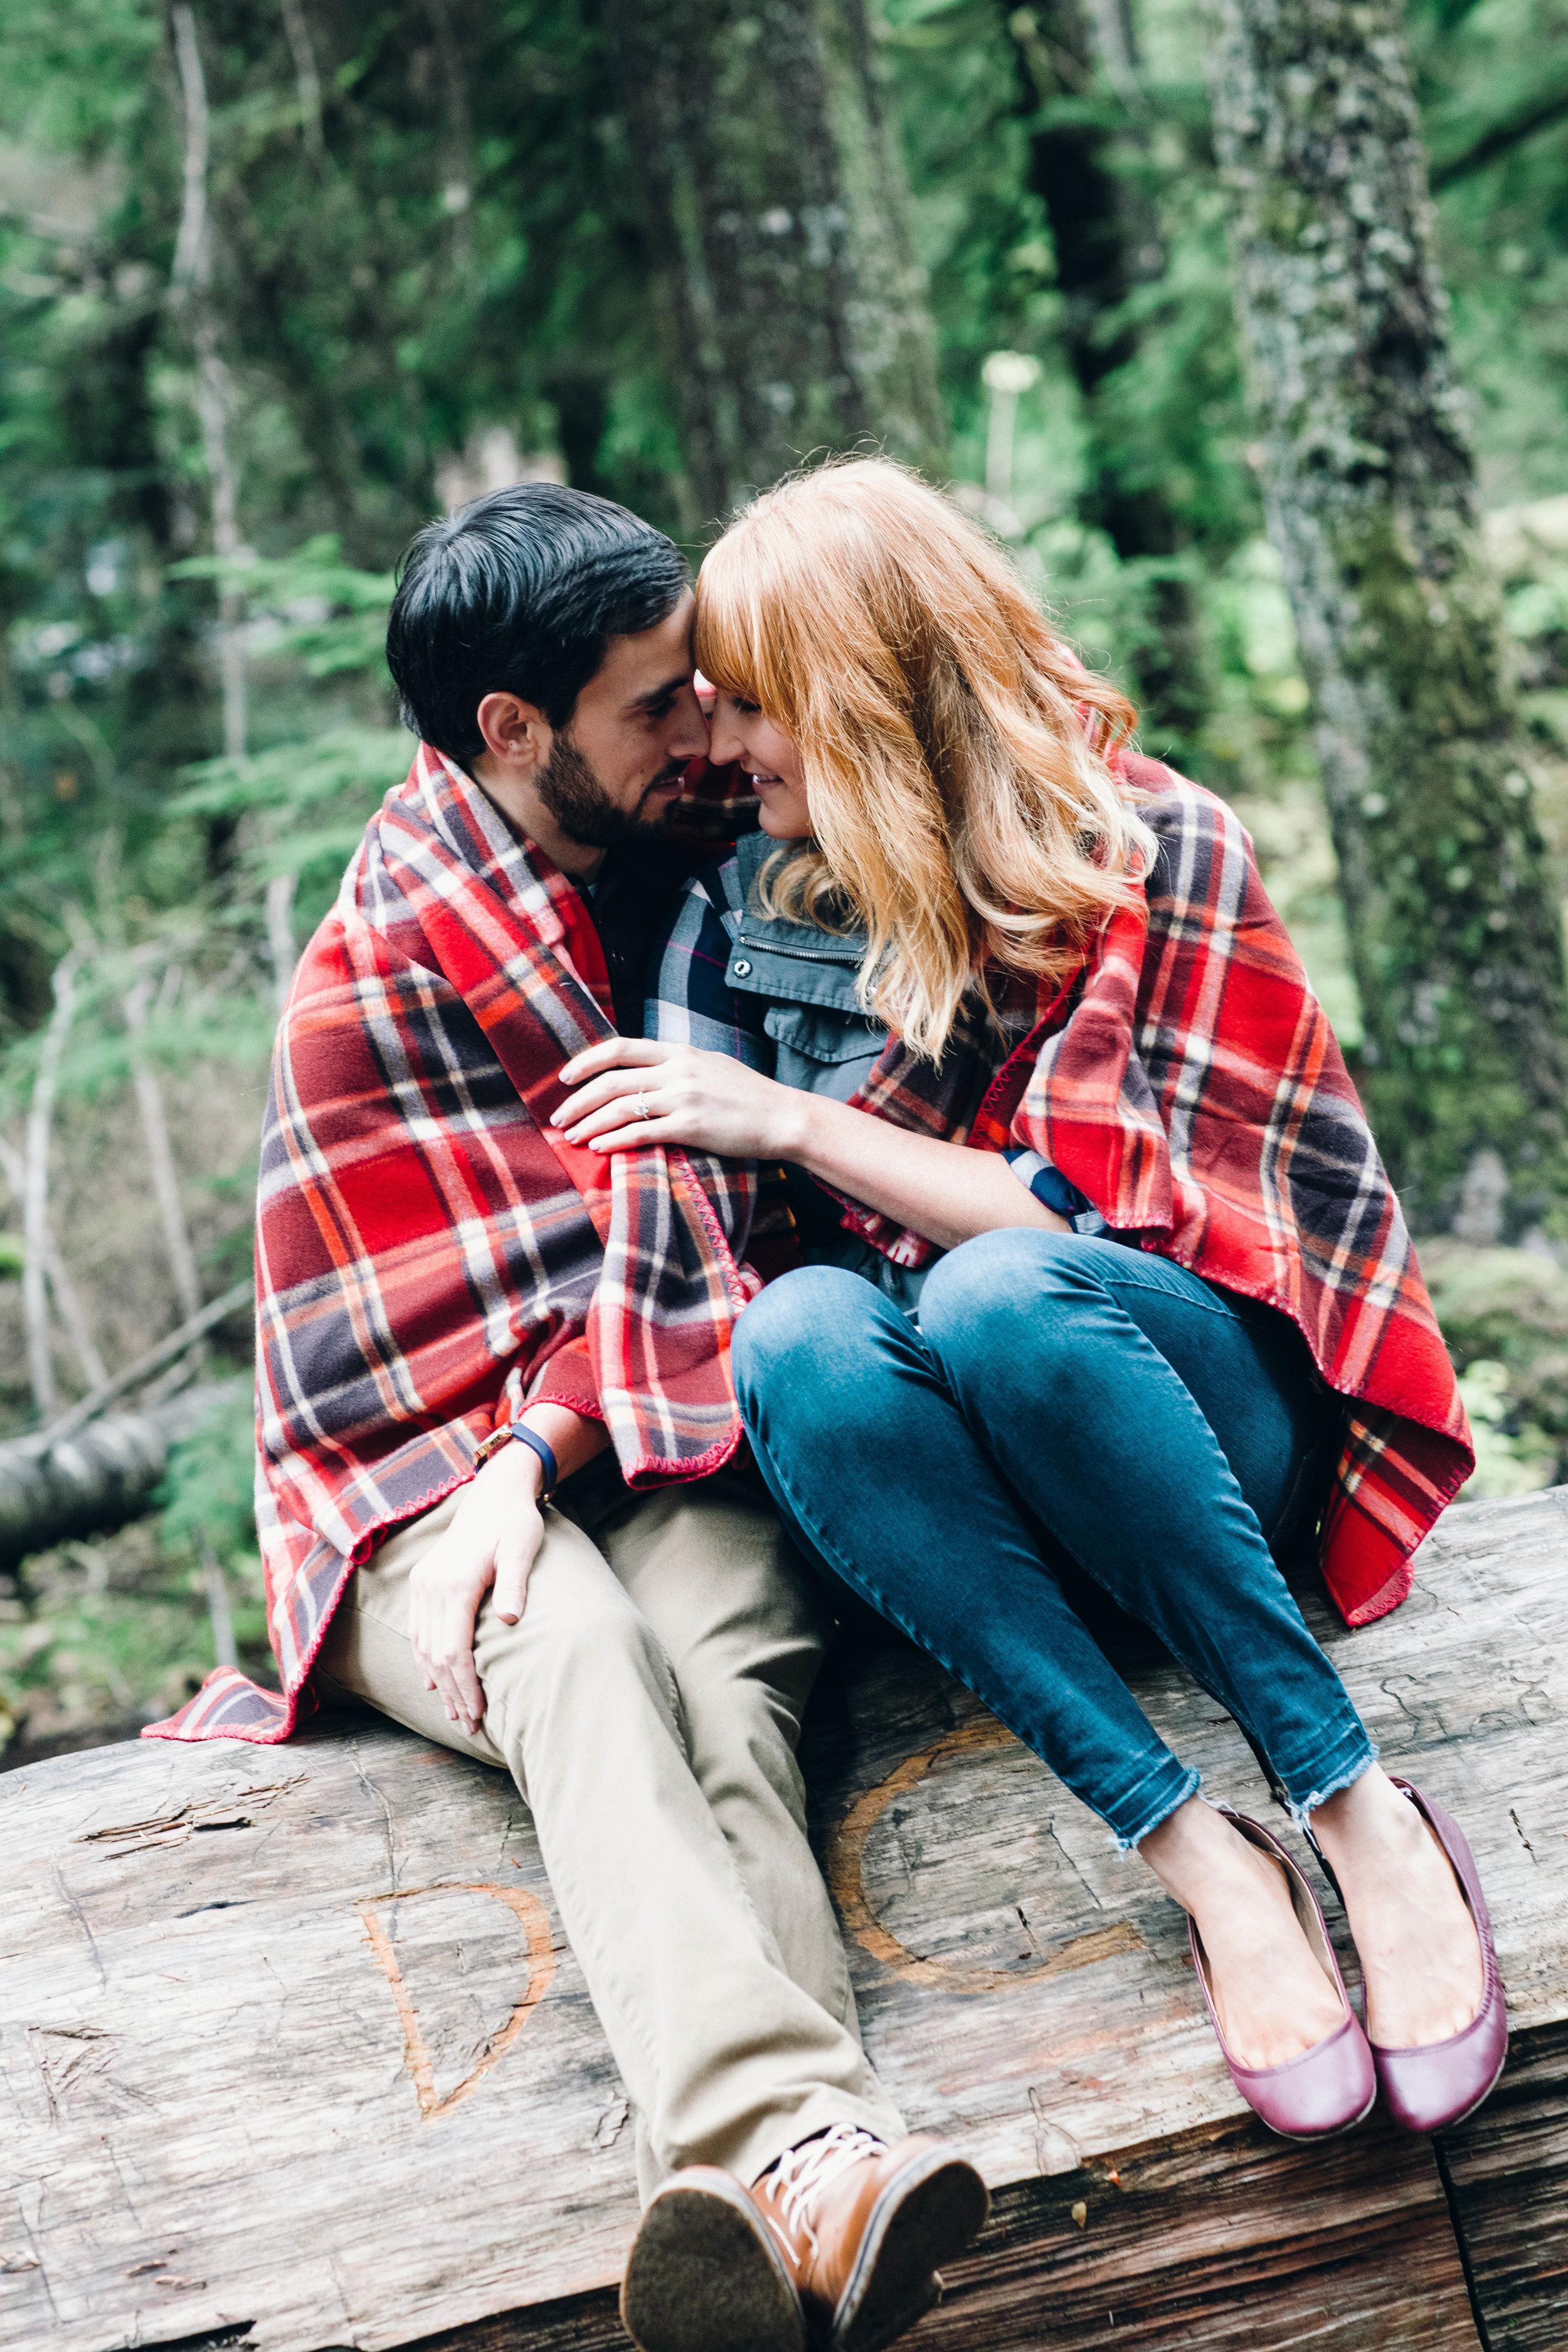 Ryan+Nicole_Franklin+Falls+Engagement_APW2016_21.JPG